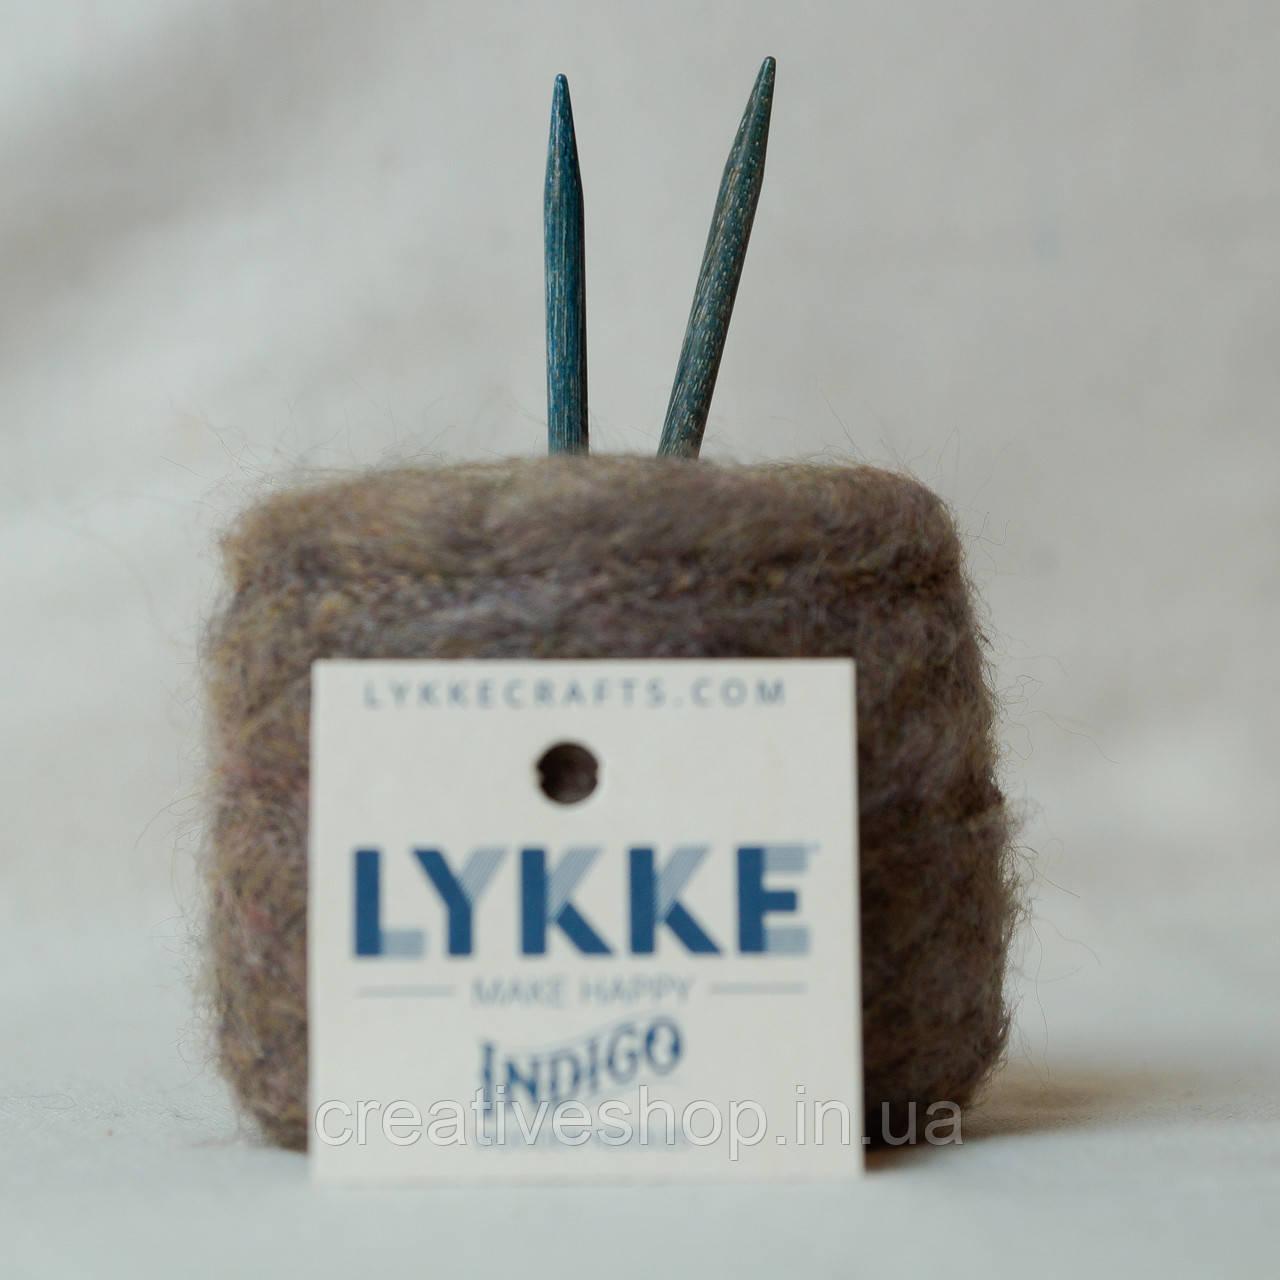 Съемные  стандартные спицы Lykke Indigo 12